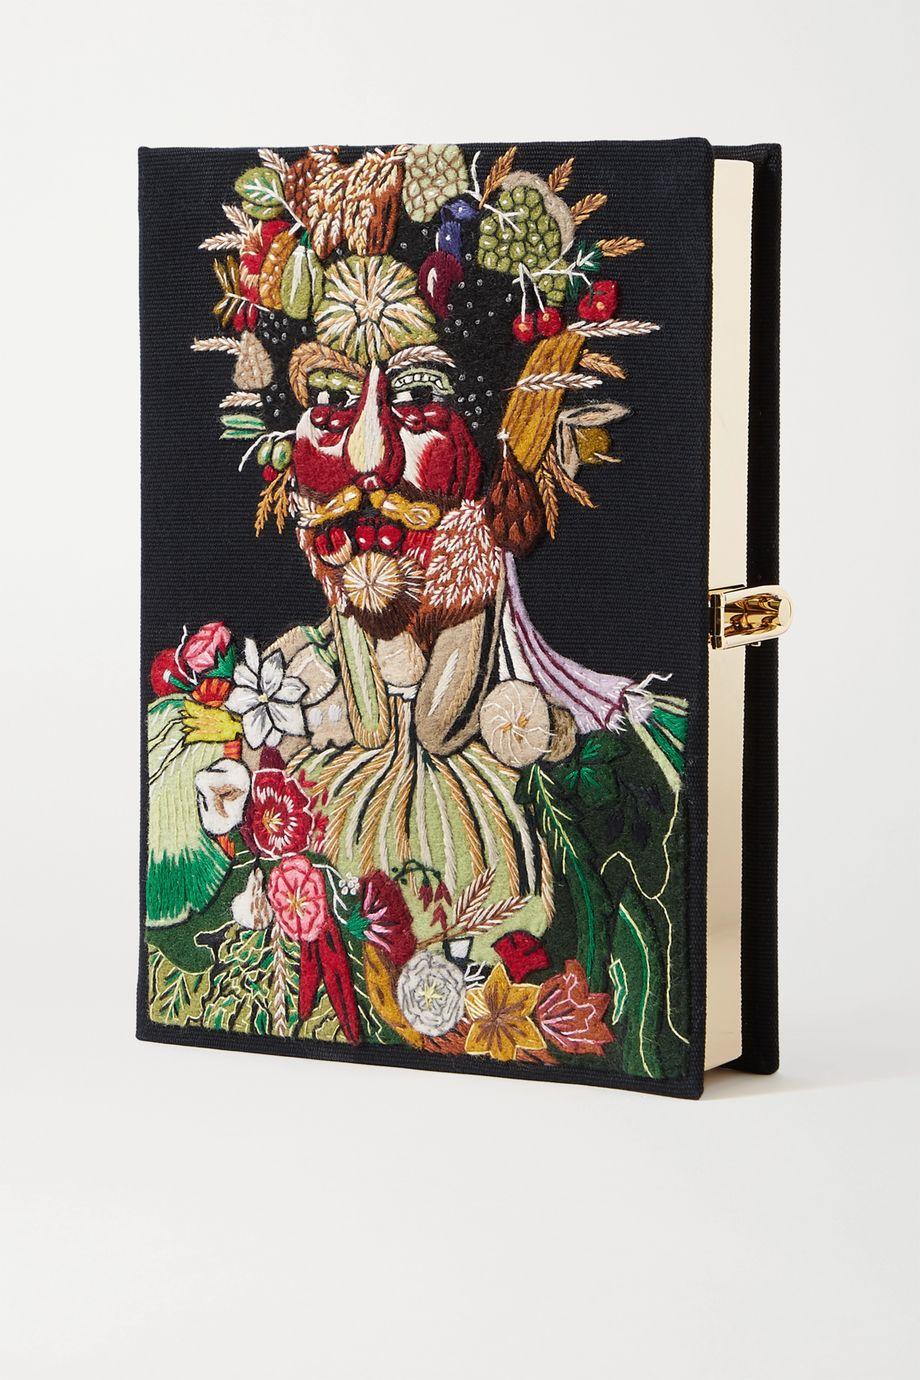 Olympia Le-Tan Arcimboldo embroidered appliquéd canvas clutch